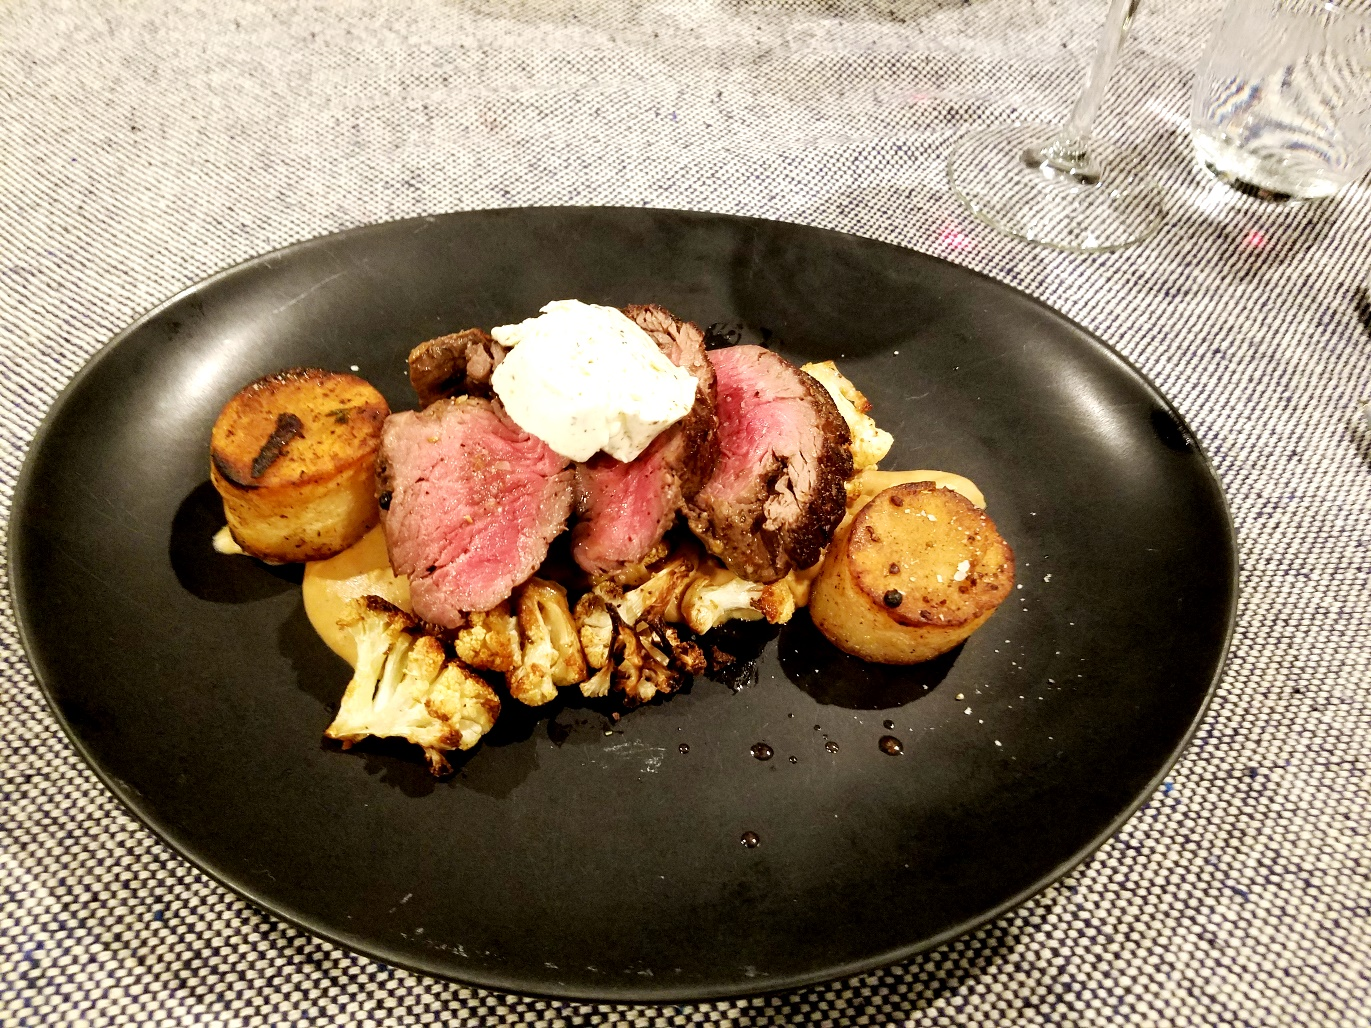 Dinner prepared by Chef David Murray of Denim BYOB. Wine Casual